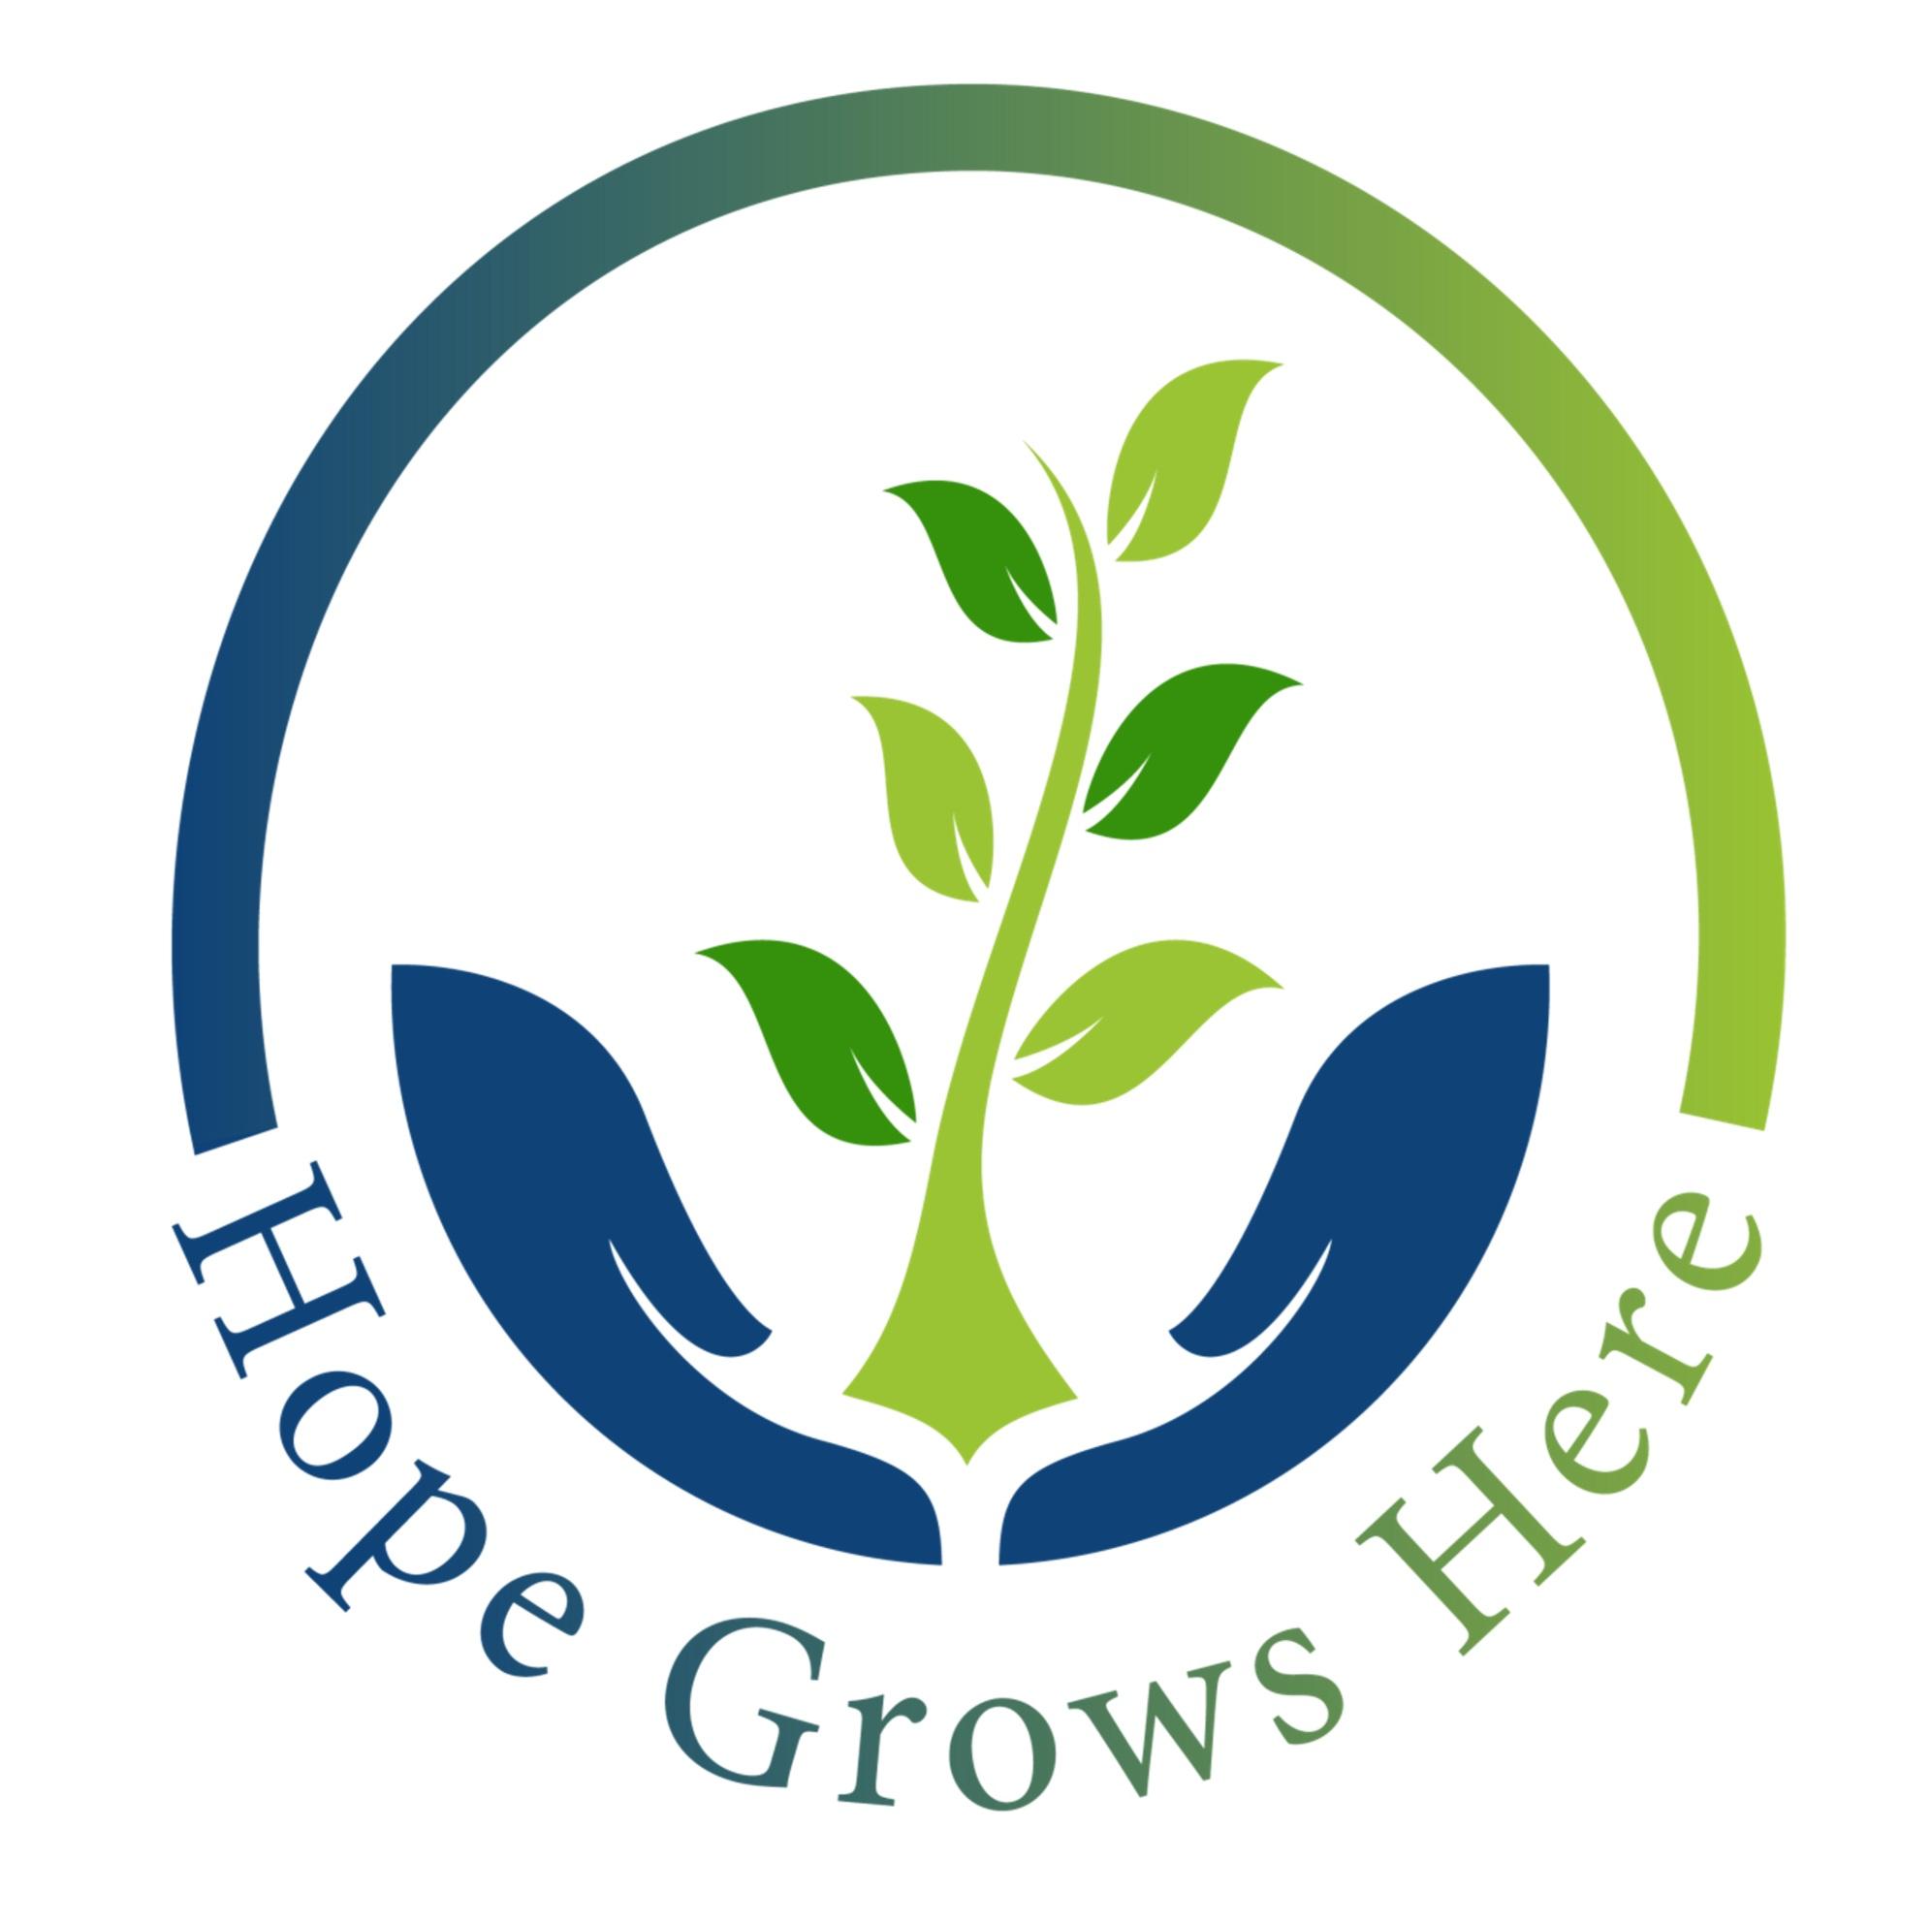 HGH+Newsletter+1+-+2018+%28Good+Shep+Episcopal+CO%29.jpg